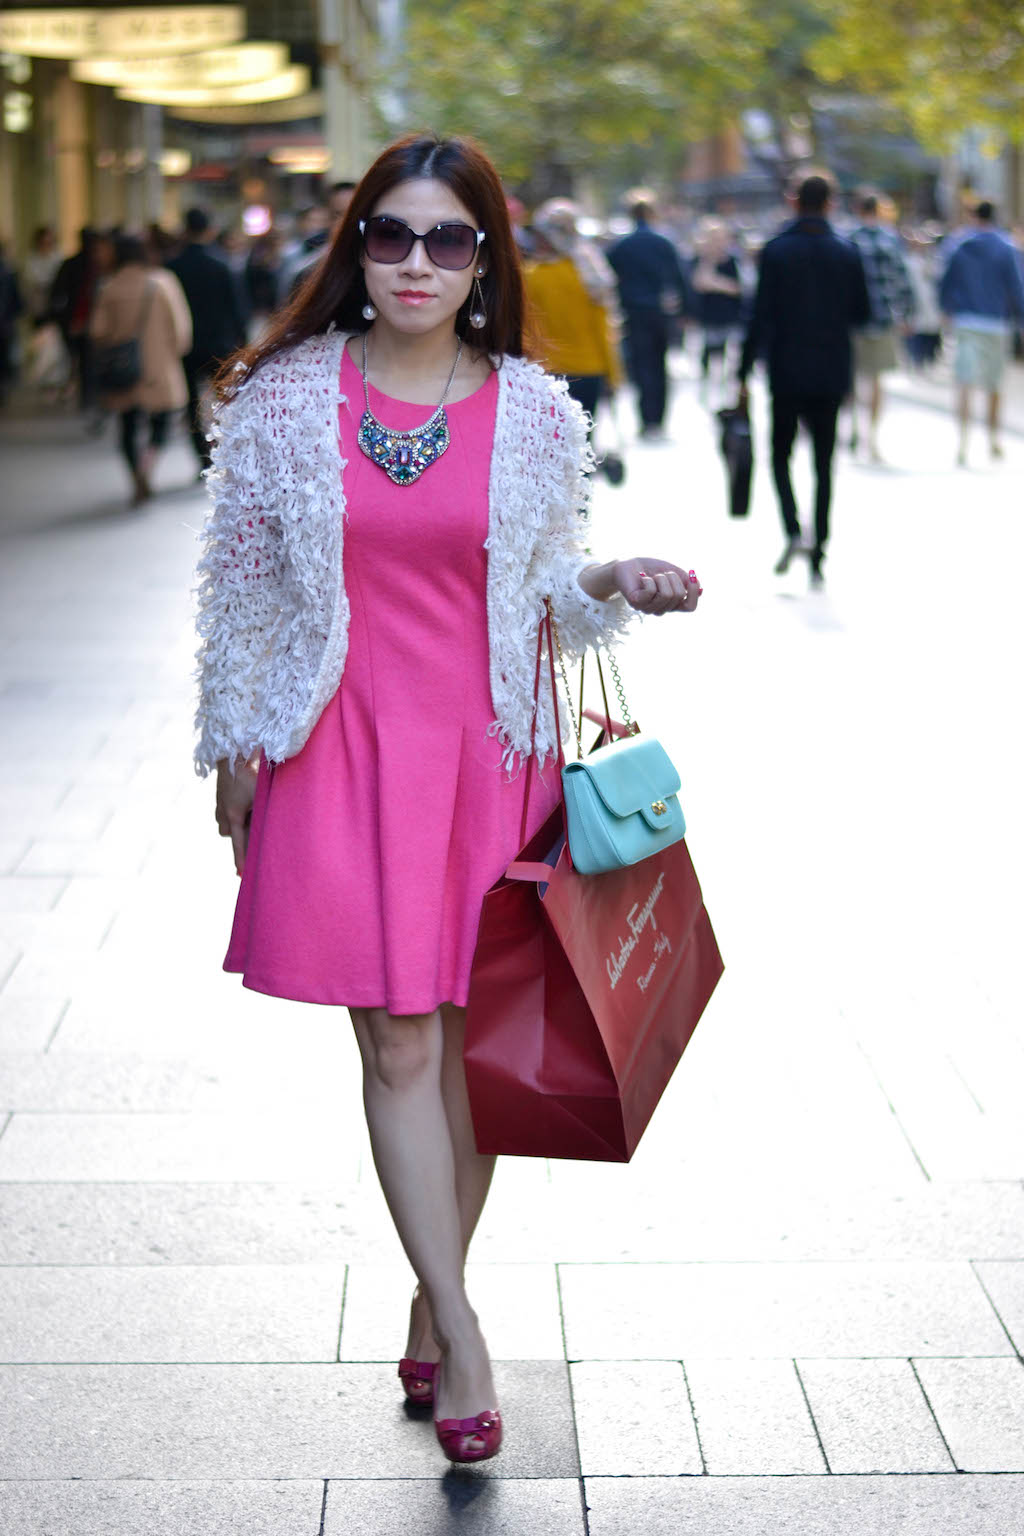 NSW: Viviana Li, Pitt St Sydney. Photo: Alice Scriberras